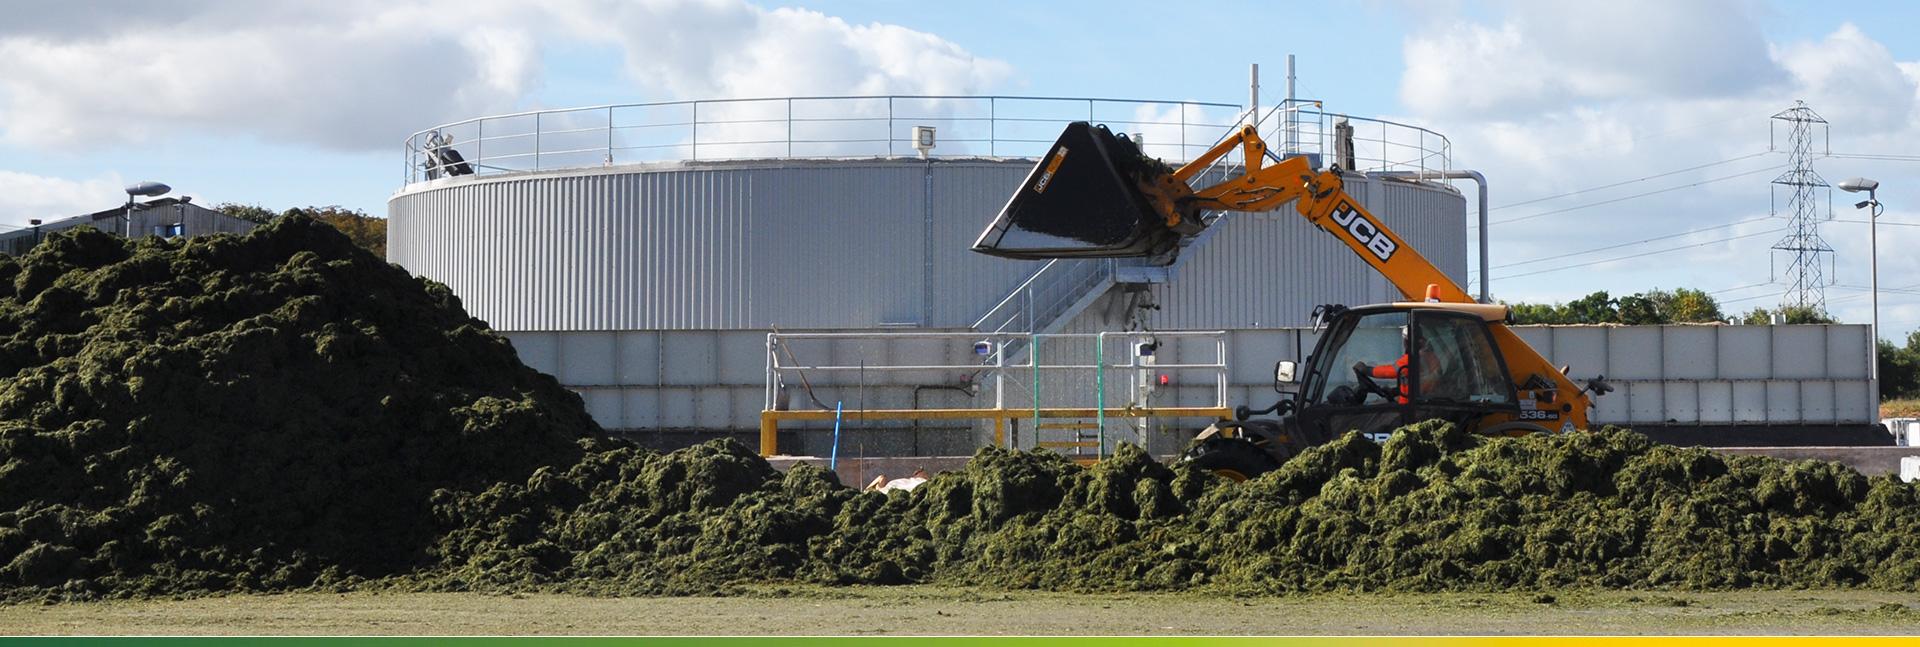 GFL Zero Carbon - Farm Waste